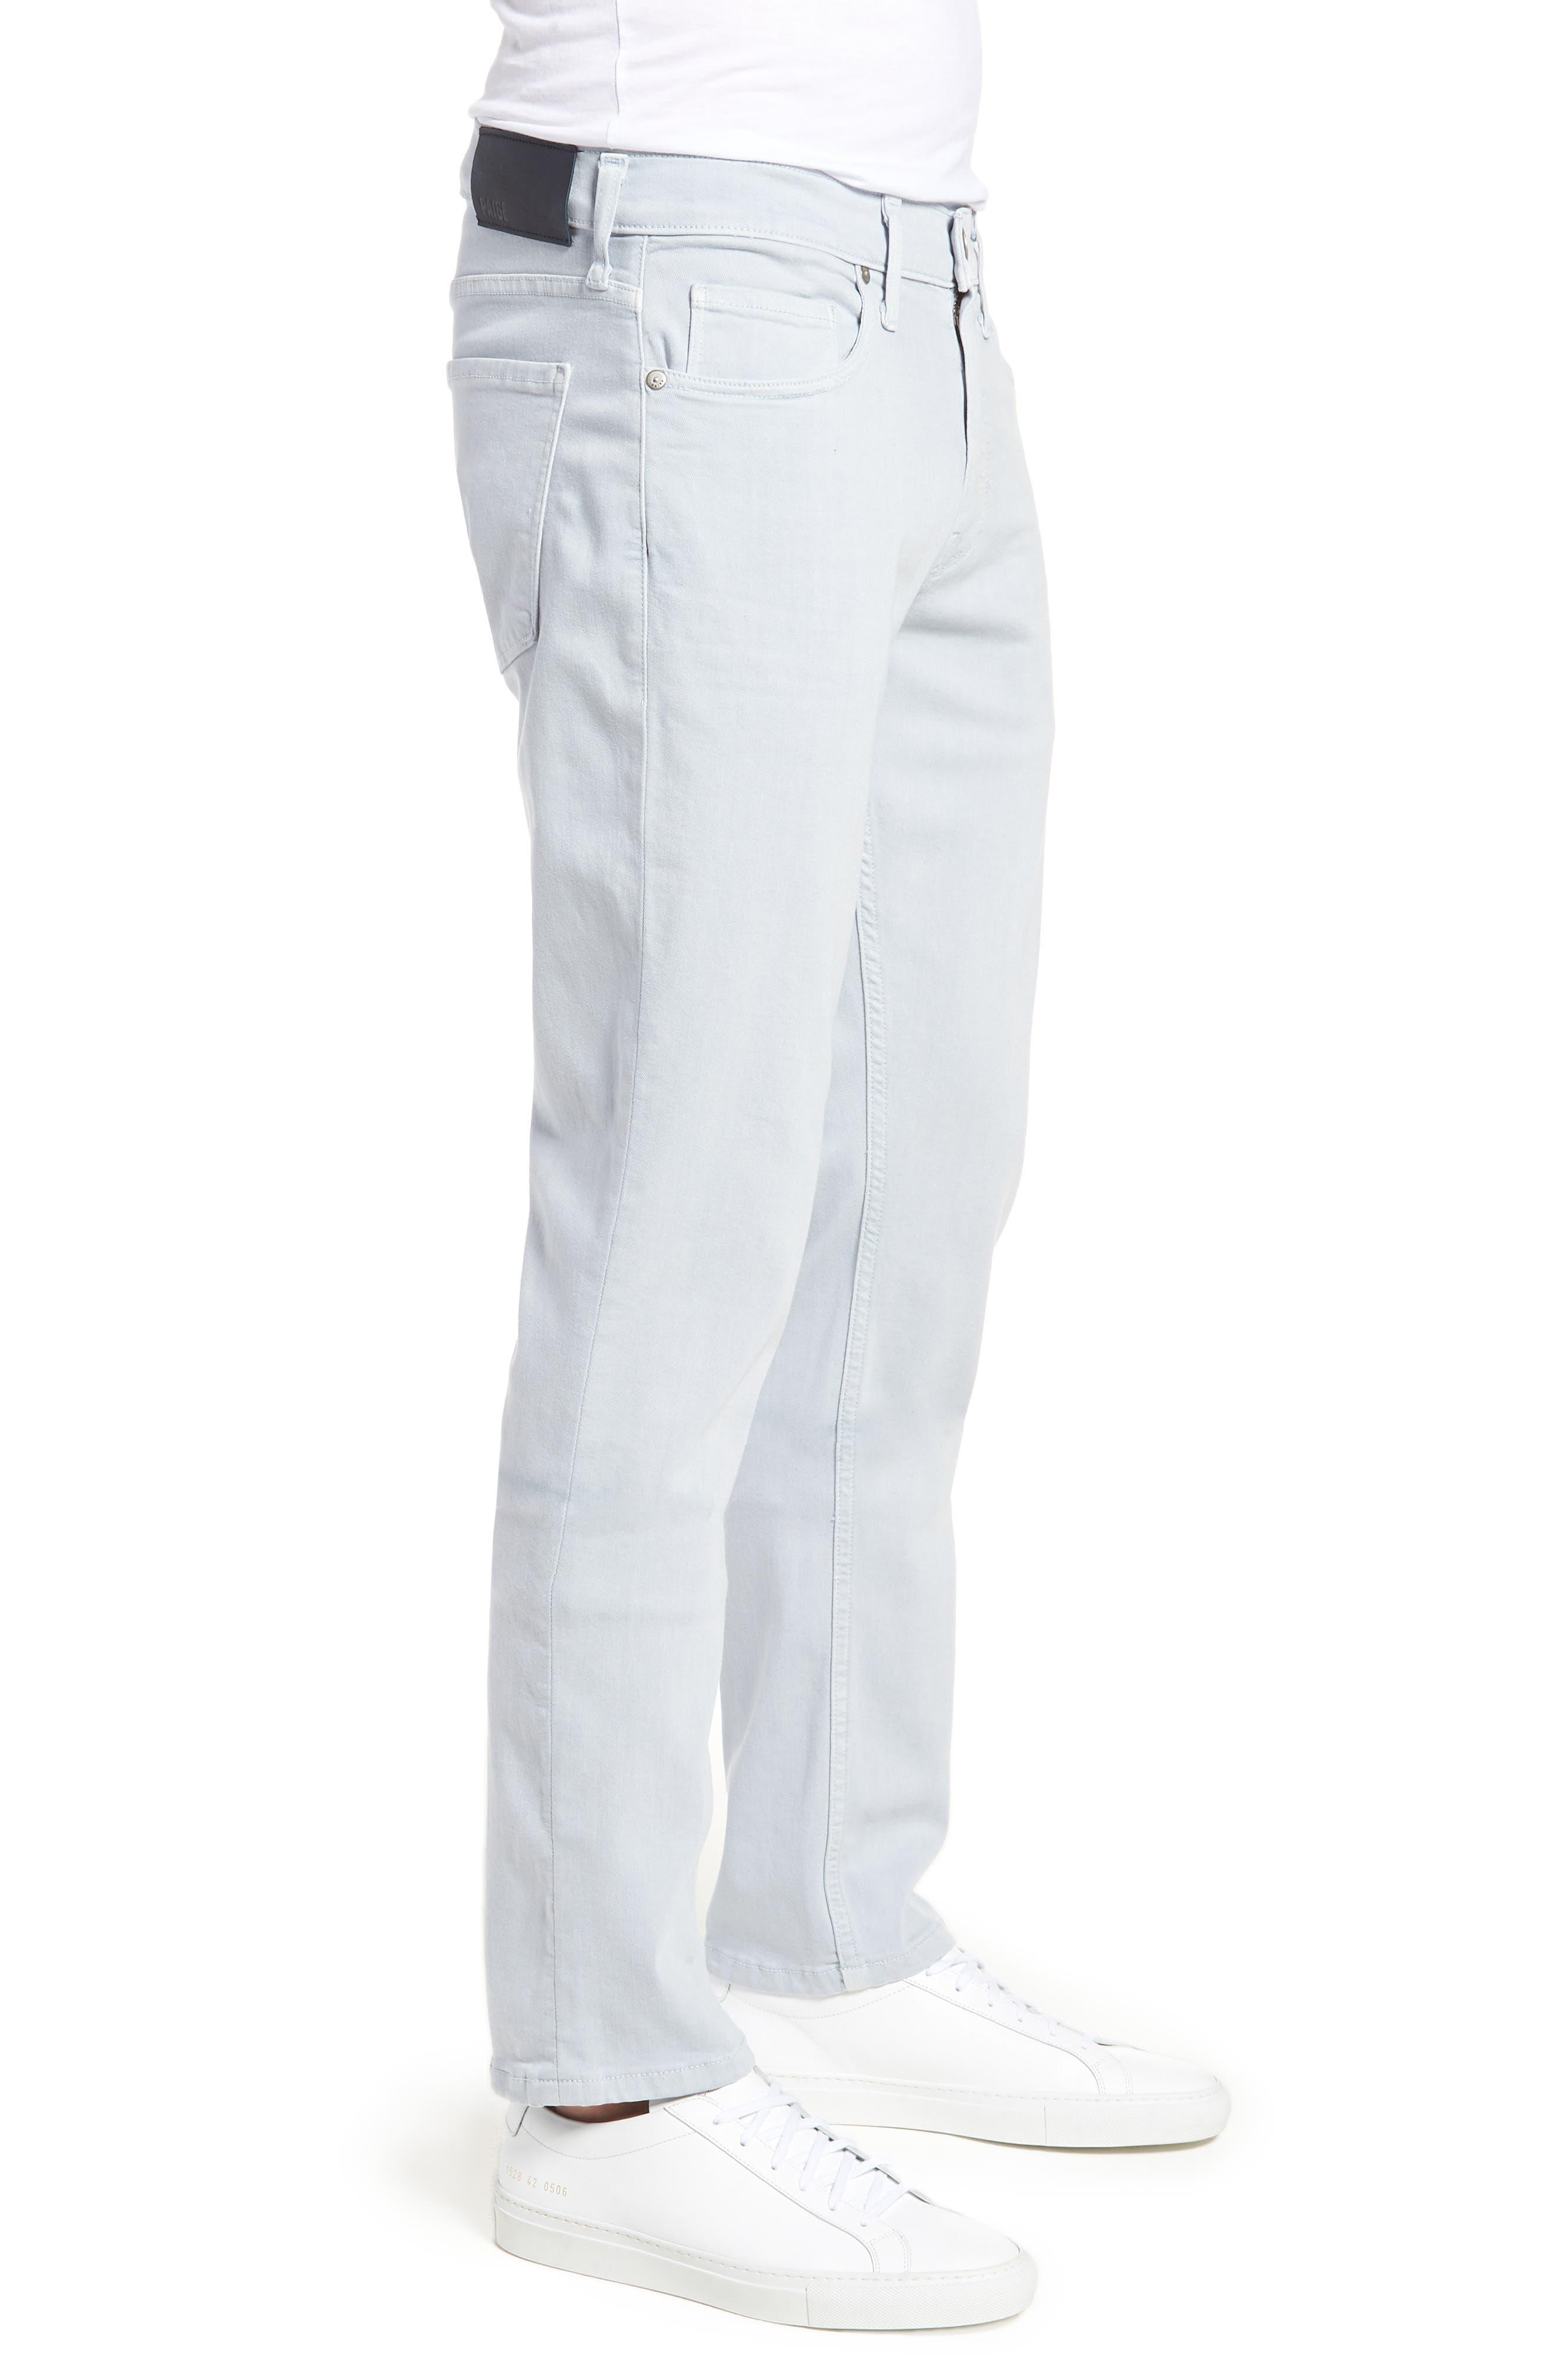 Transcend - Federal Slim Straight Leg Jeans,                             Alternate thumbnail 3, color,                             450